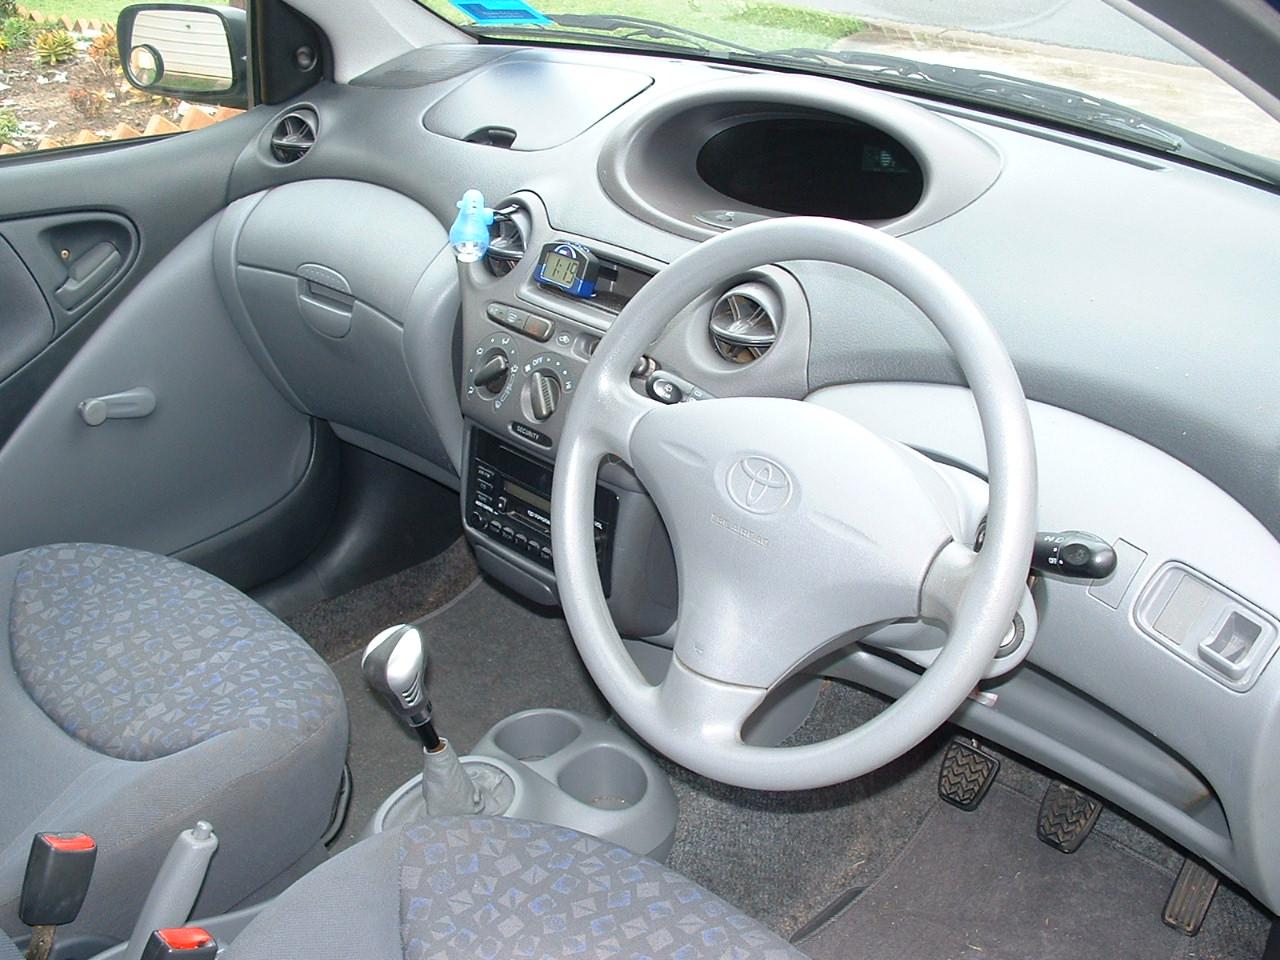 2001 Toyota Echo Partsopen Oxygen Sensor Location Src